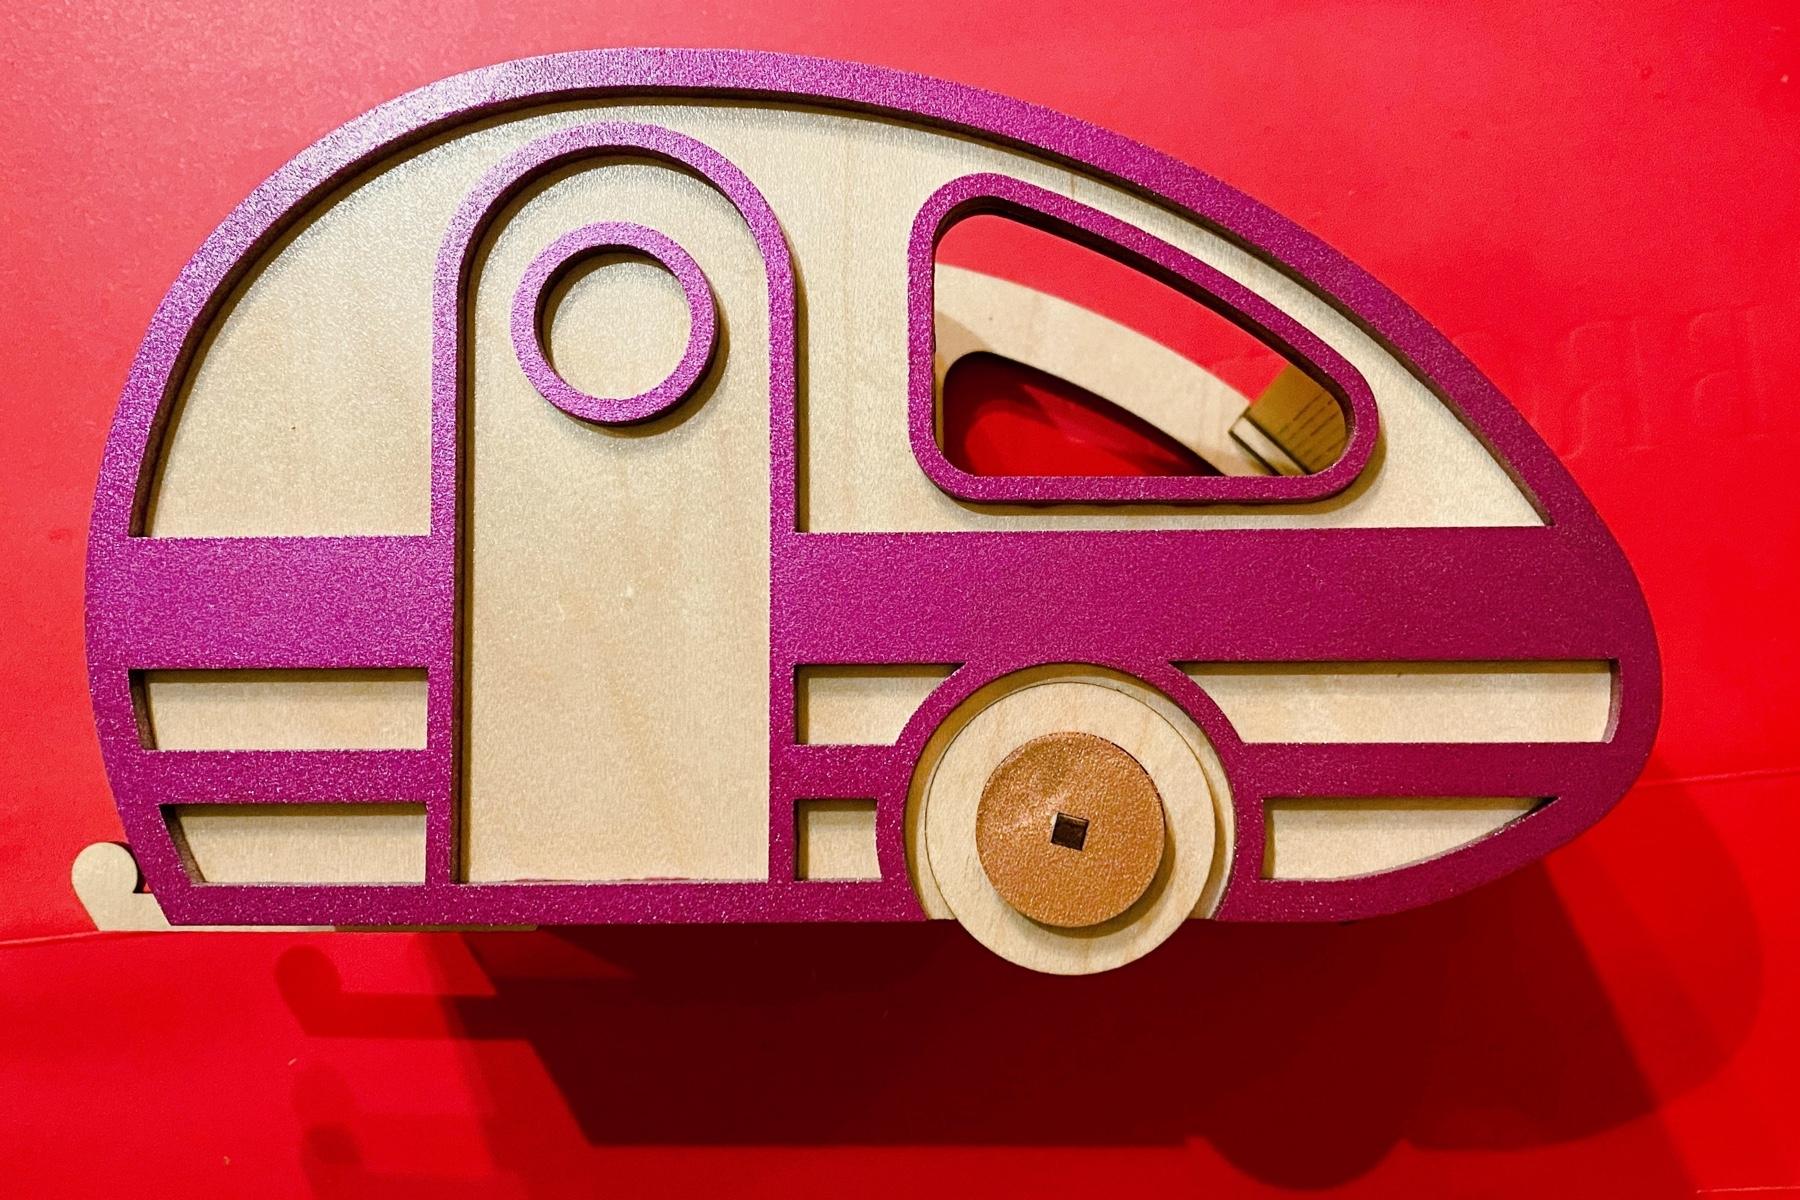 Retro camper in metallic pink